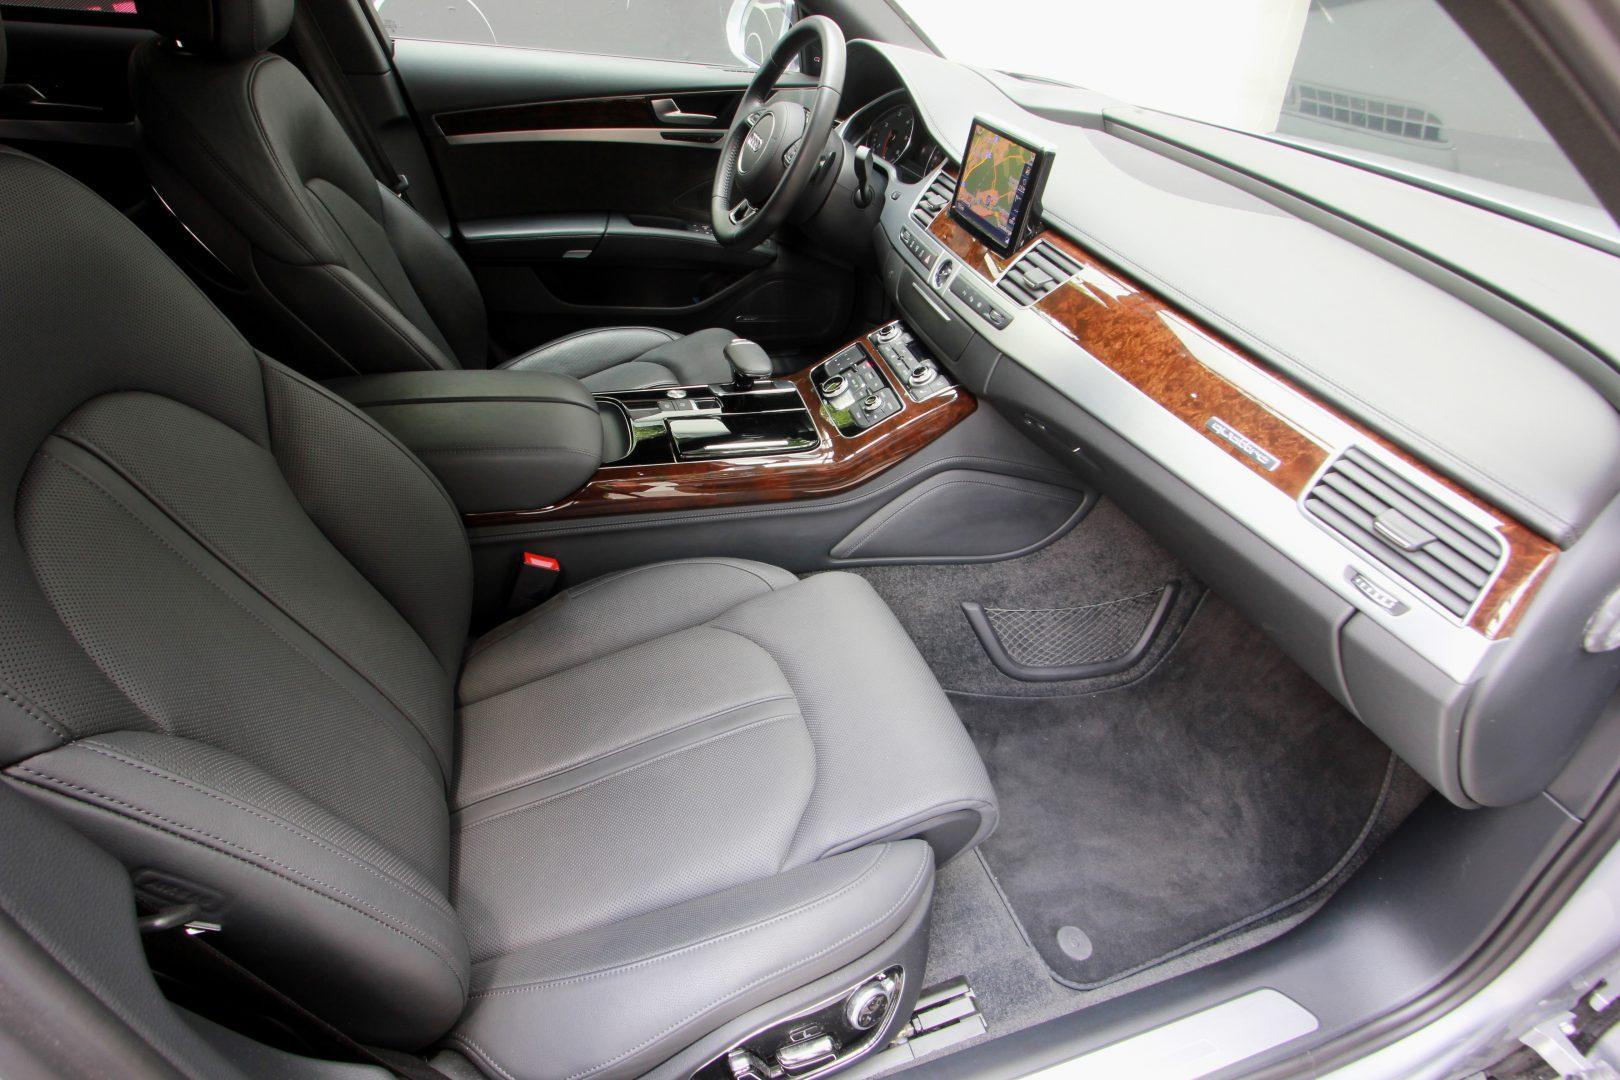 AIL Audi A8 3.0 TDI DAB Bose  8